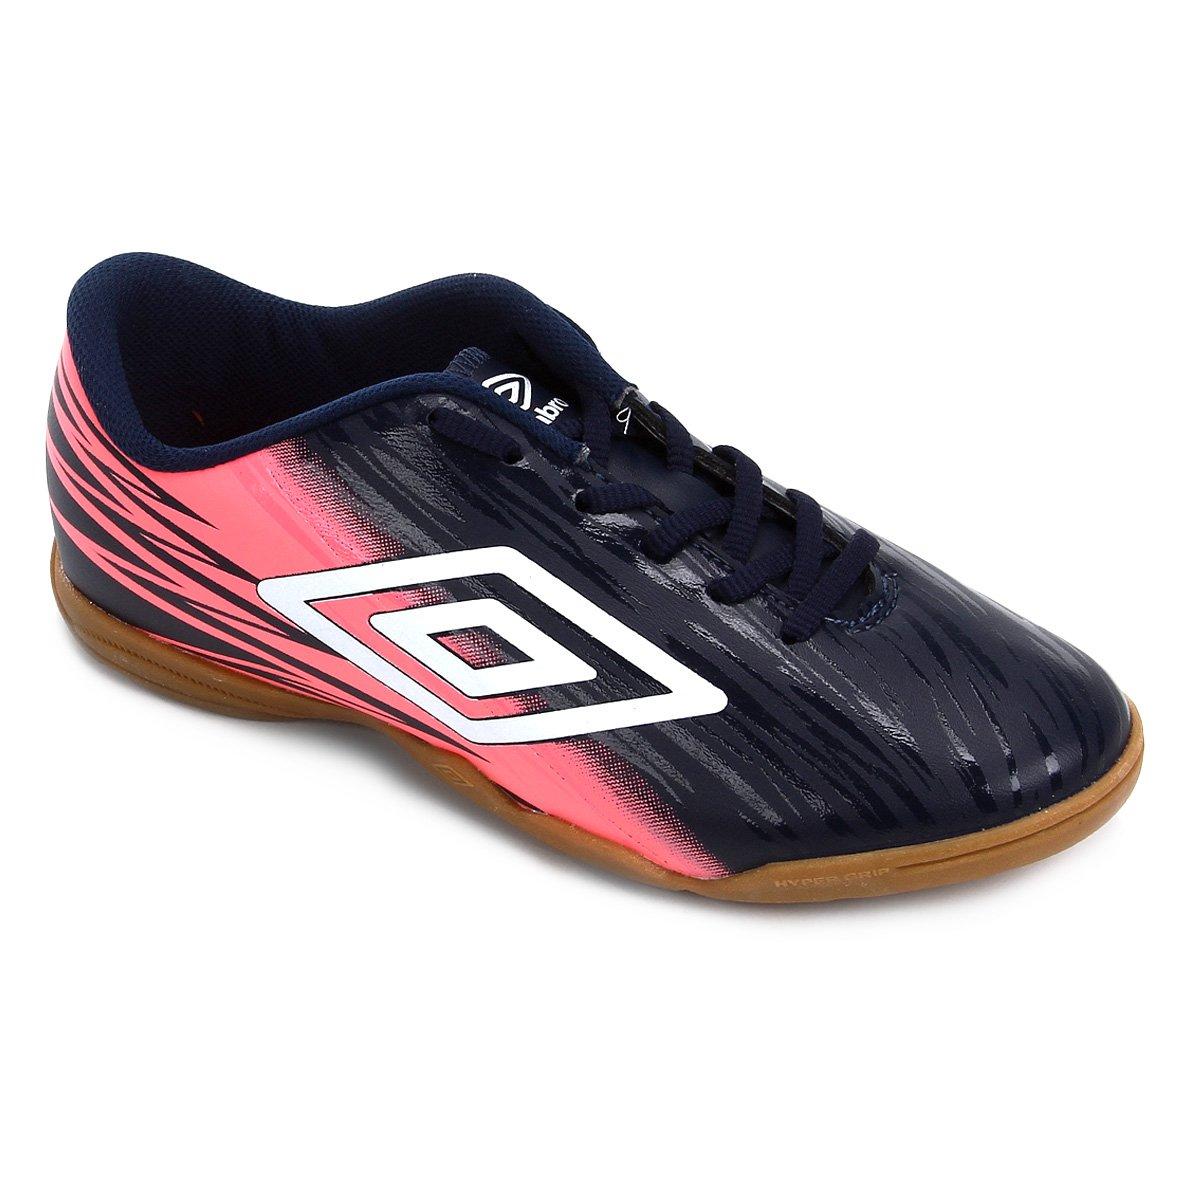 54f52a58ef Chuteira Futsal Umbro Hit Feminina - Tam  39 - Shopping TudoAzul